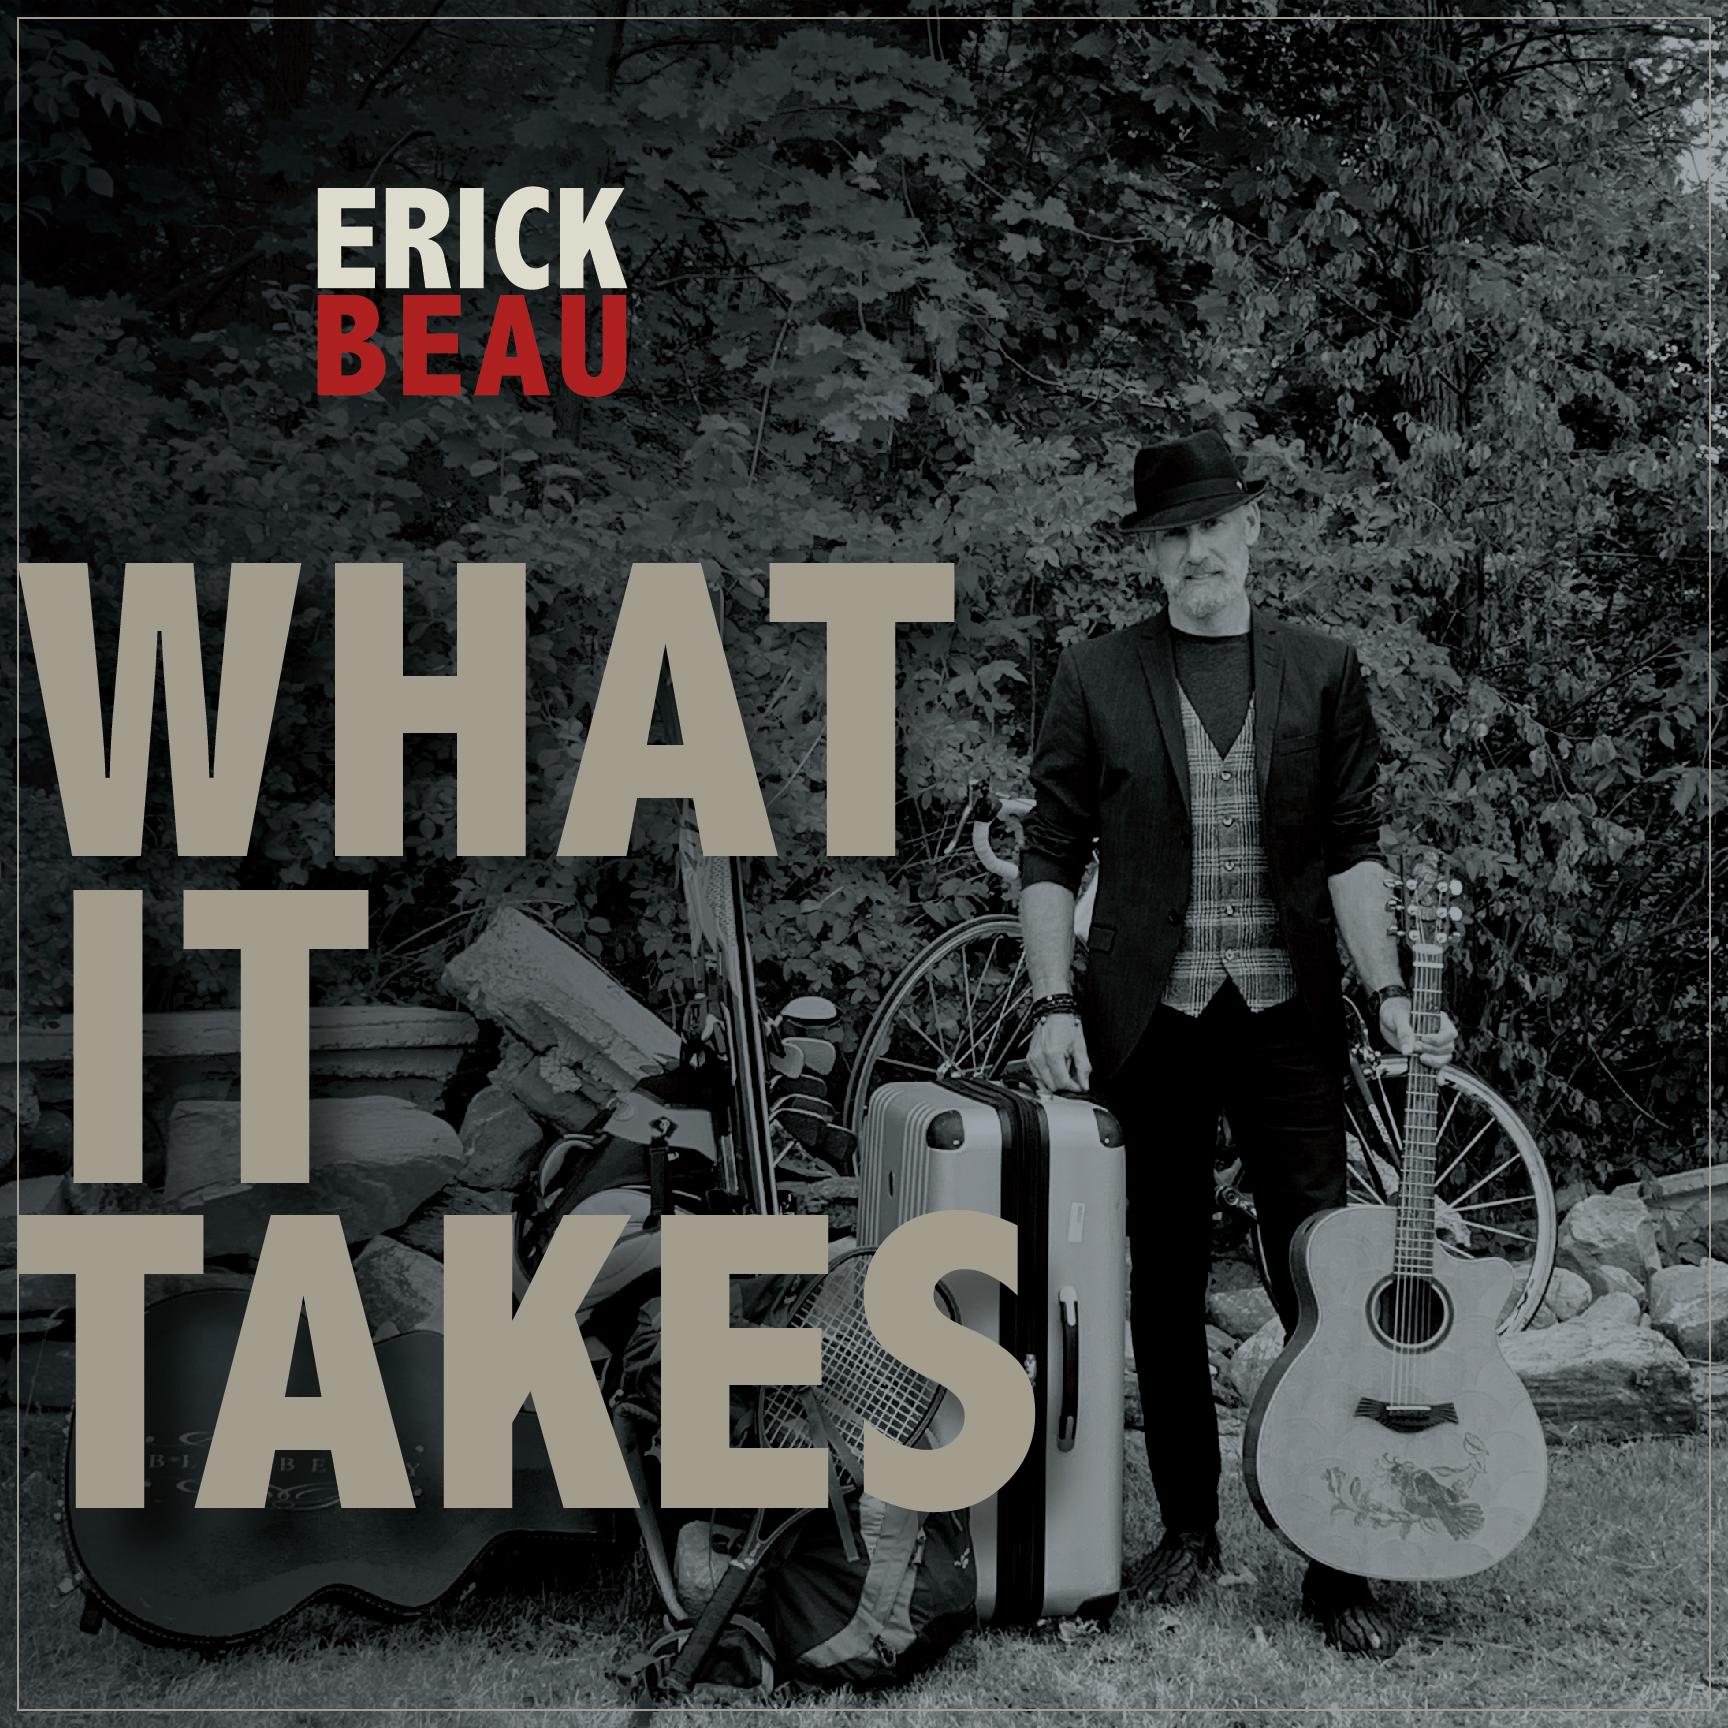 Erick Beauhttps://music.apple.com/ca/album/what-it-takes/1559209823?i=1559209826